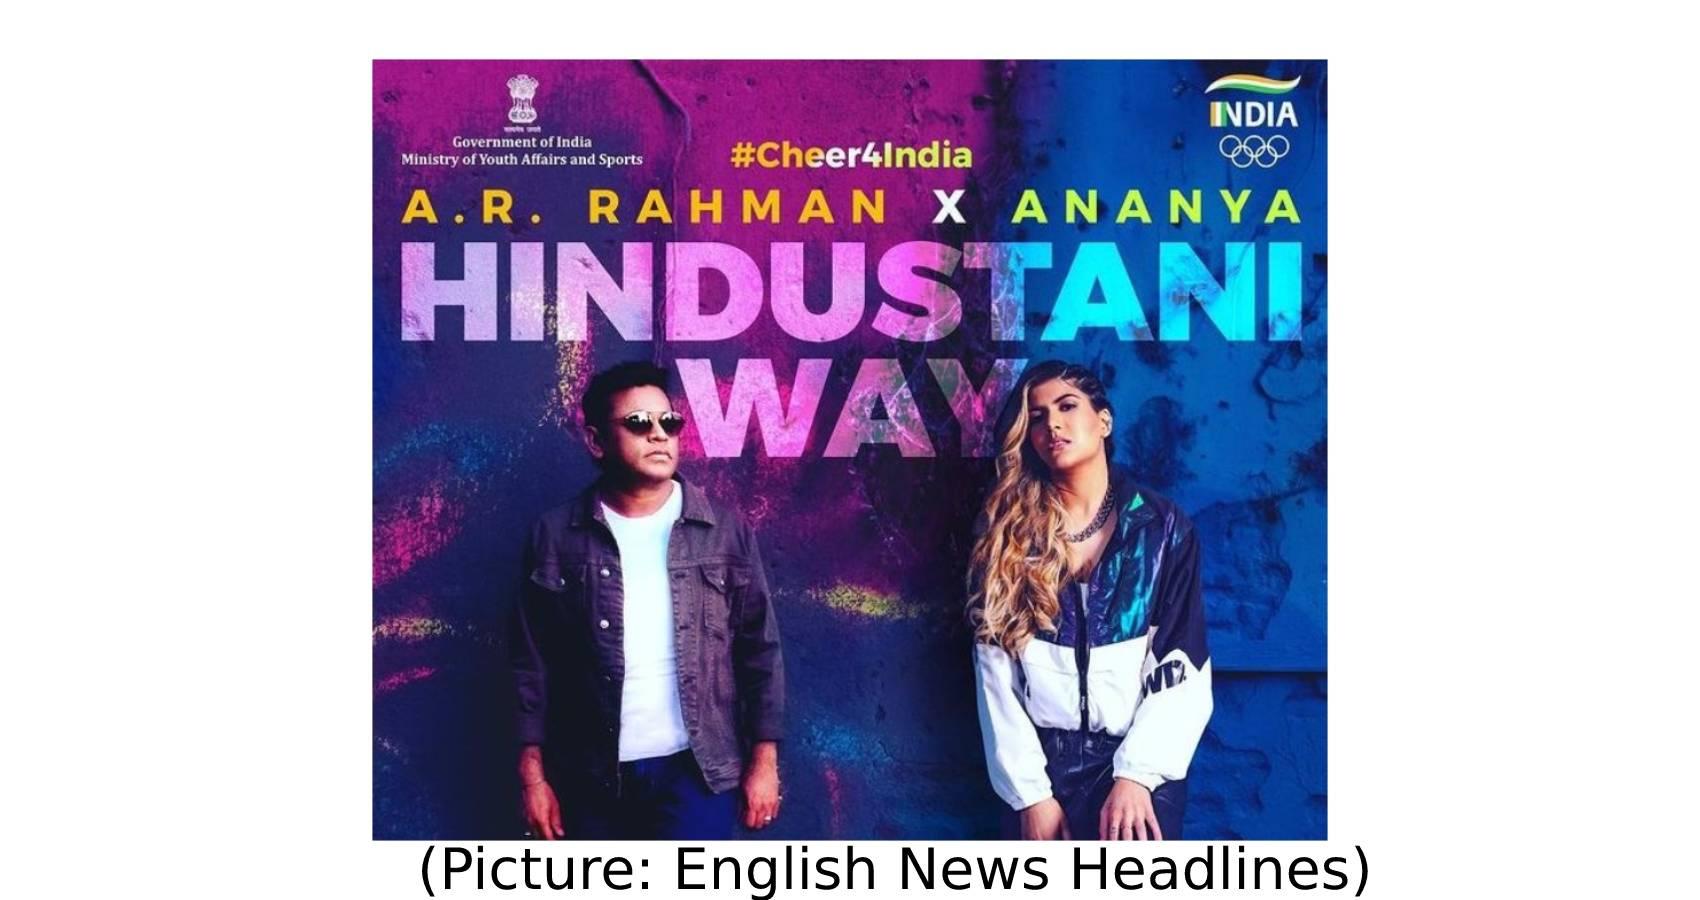 A R Rahman & Ananya Create India's Olympics Anthem